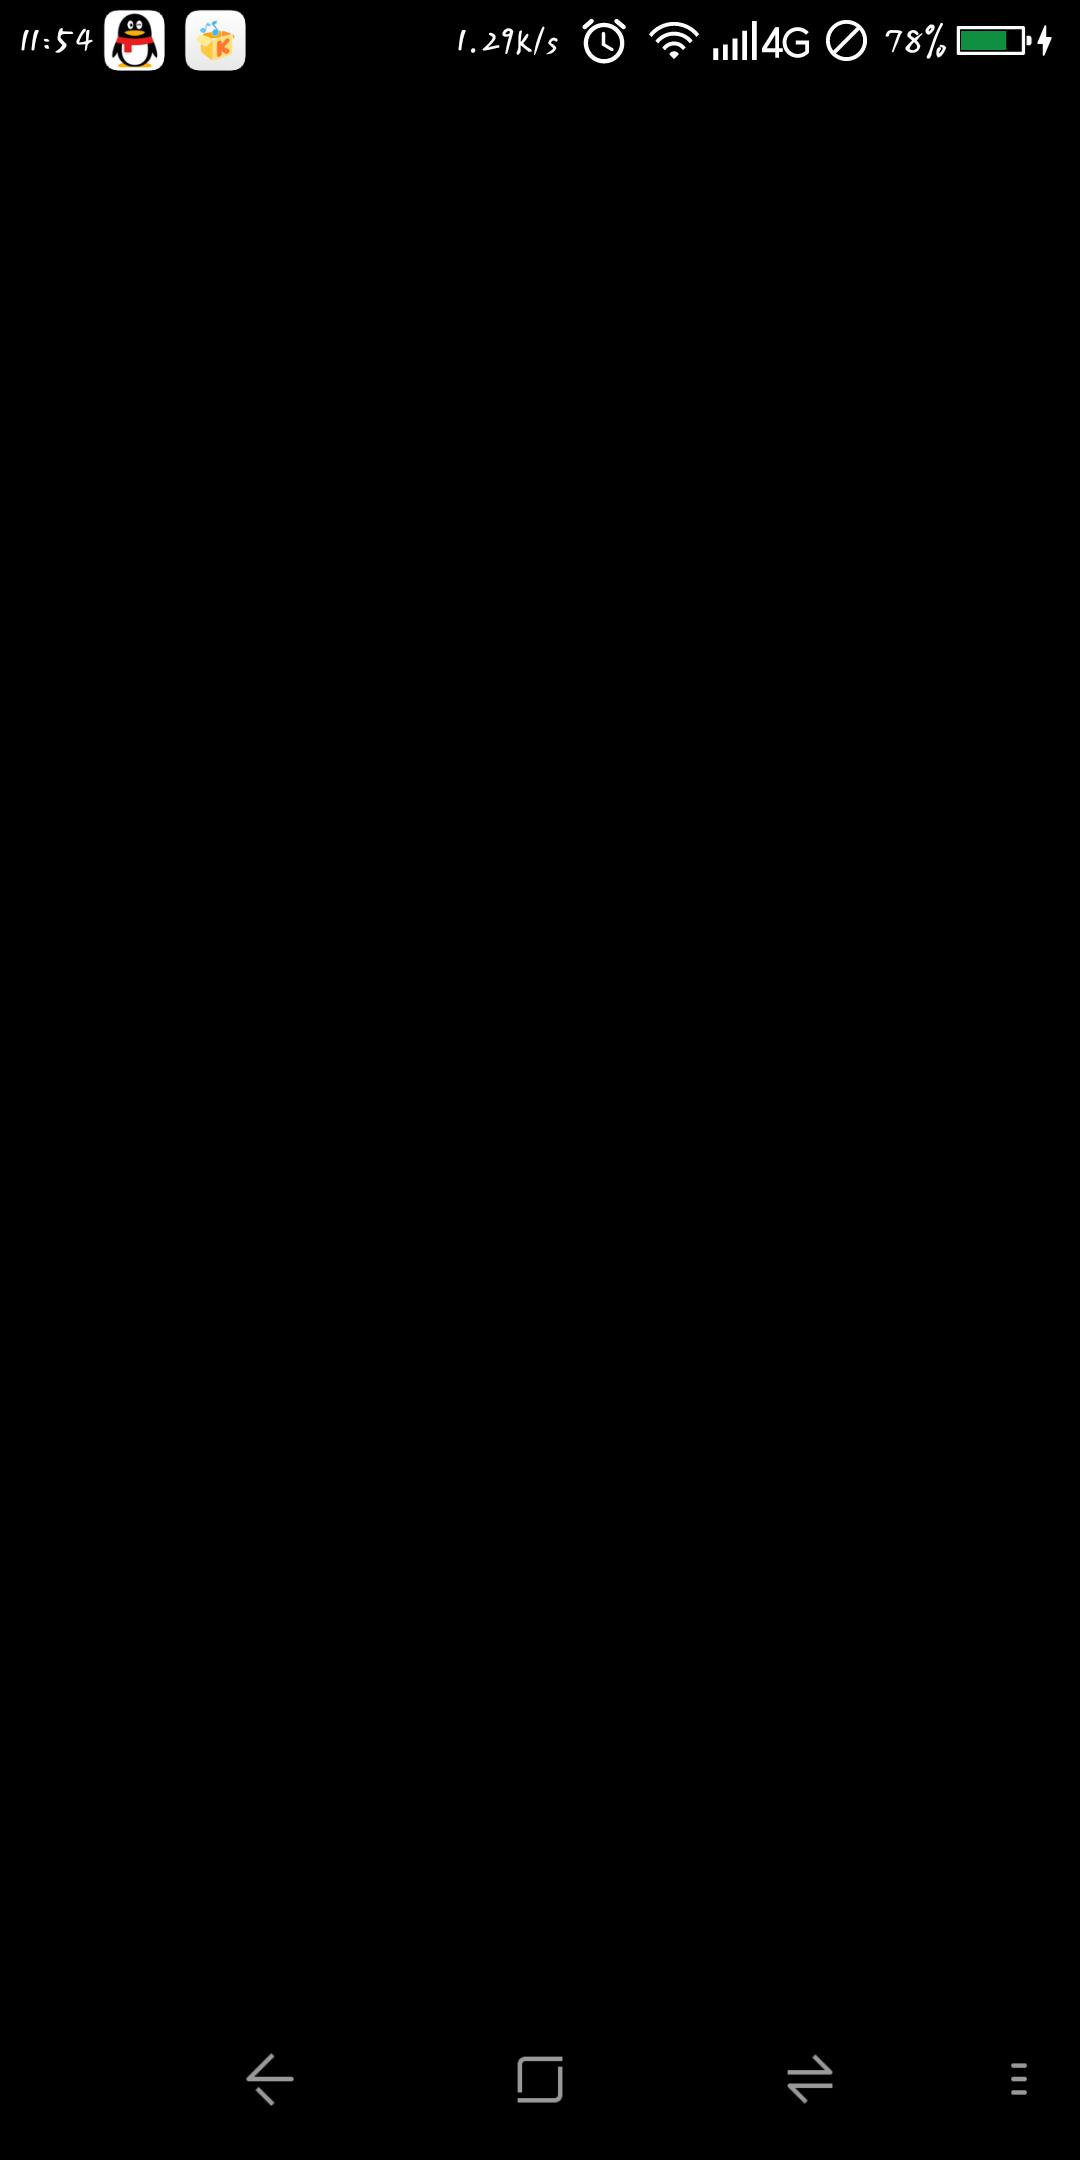 Screenshot_2018-11-04-11-54-30.png